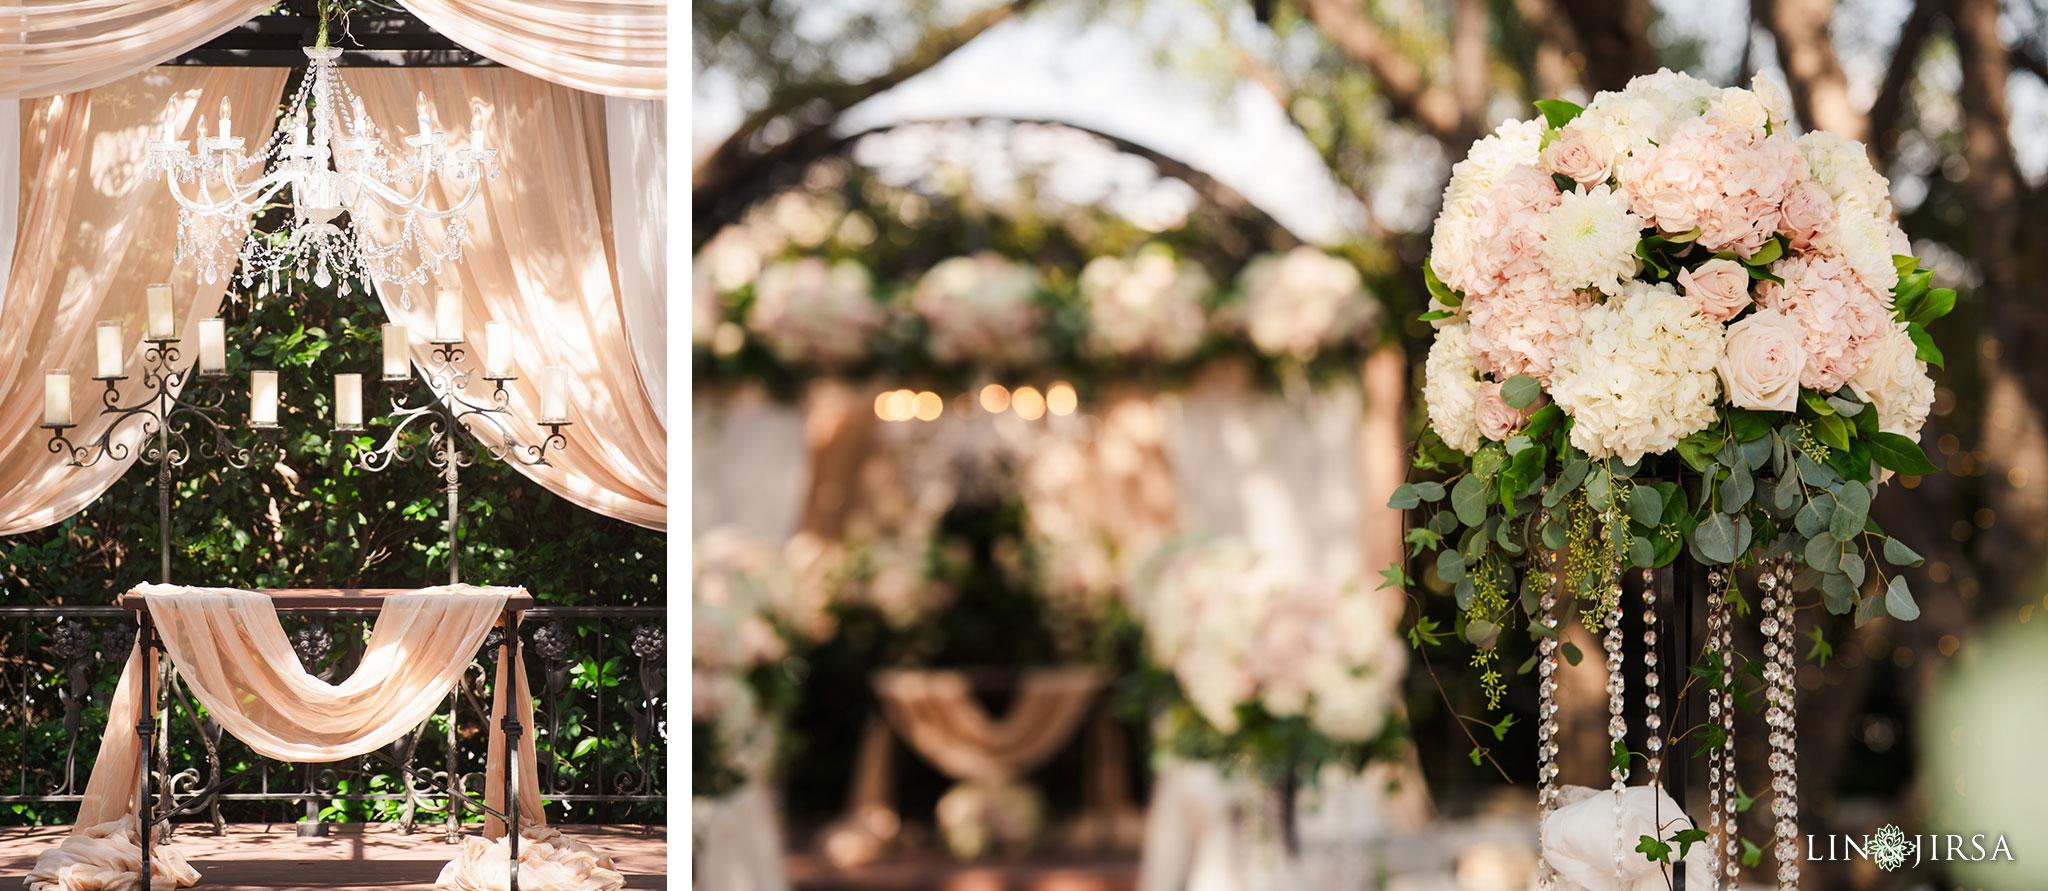 011 padua hills claremont wedding ceremony photography